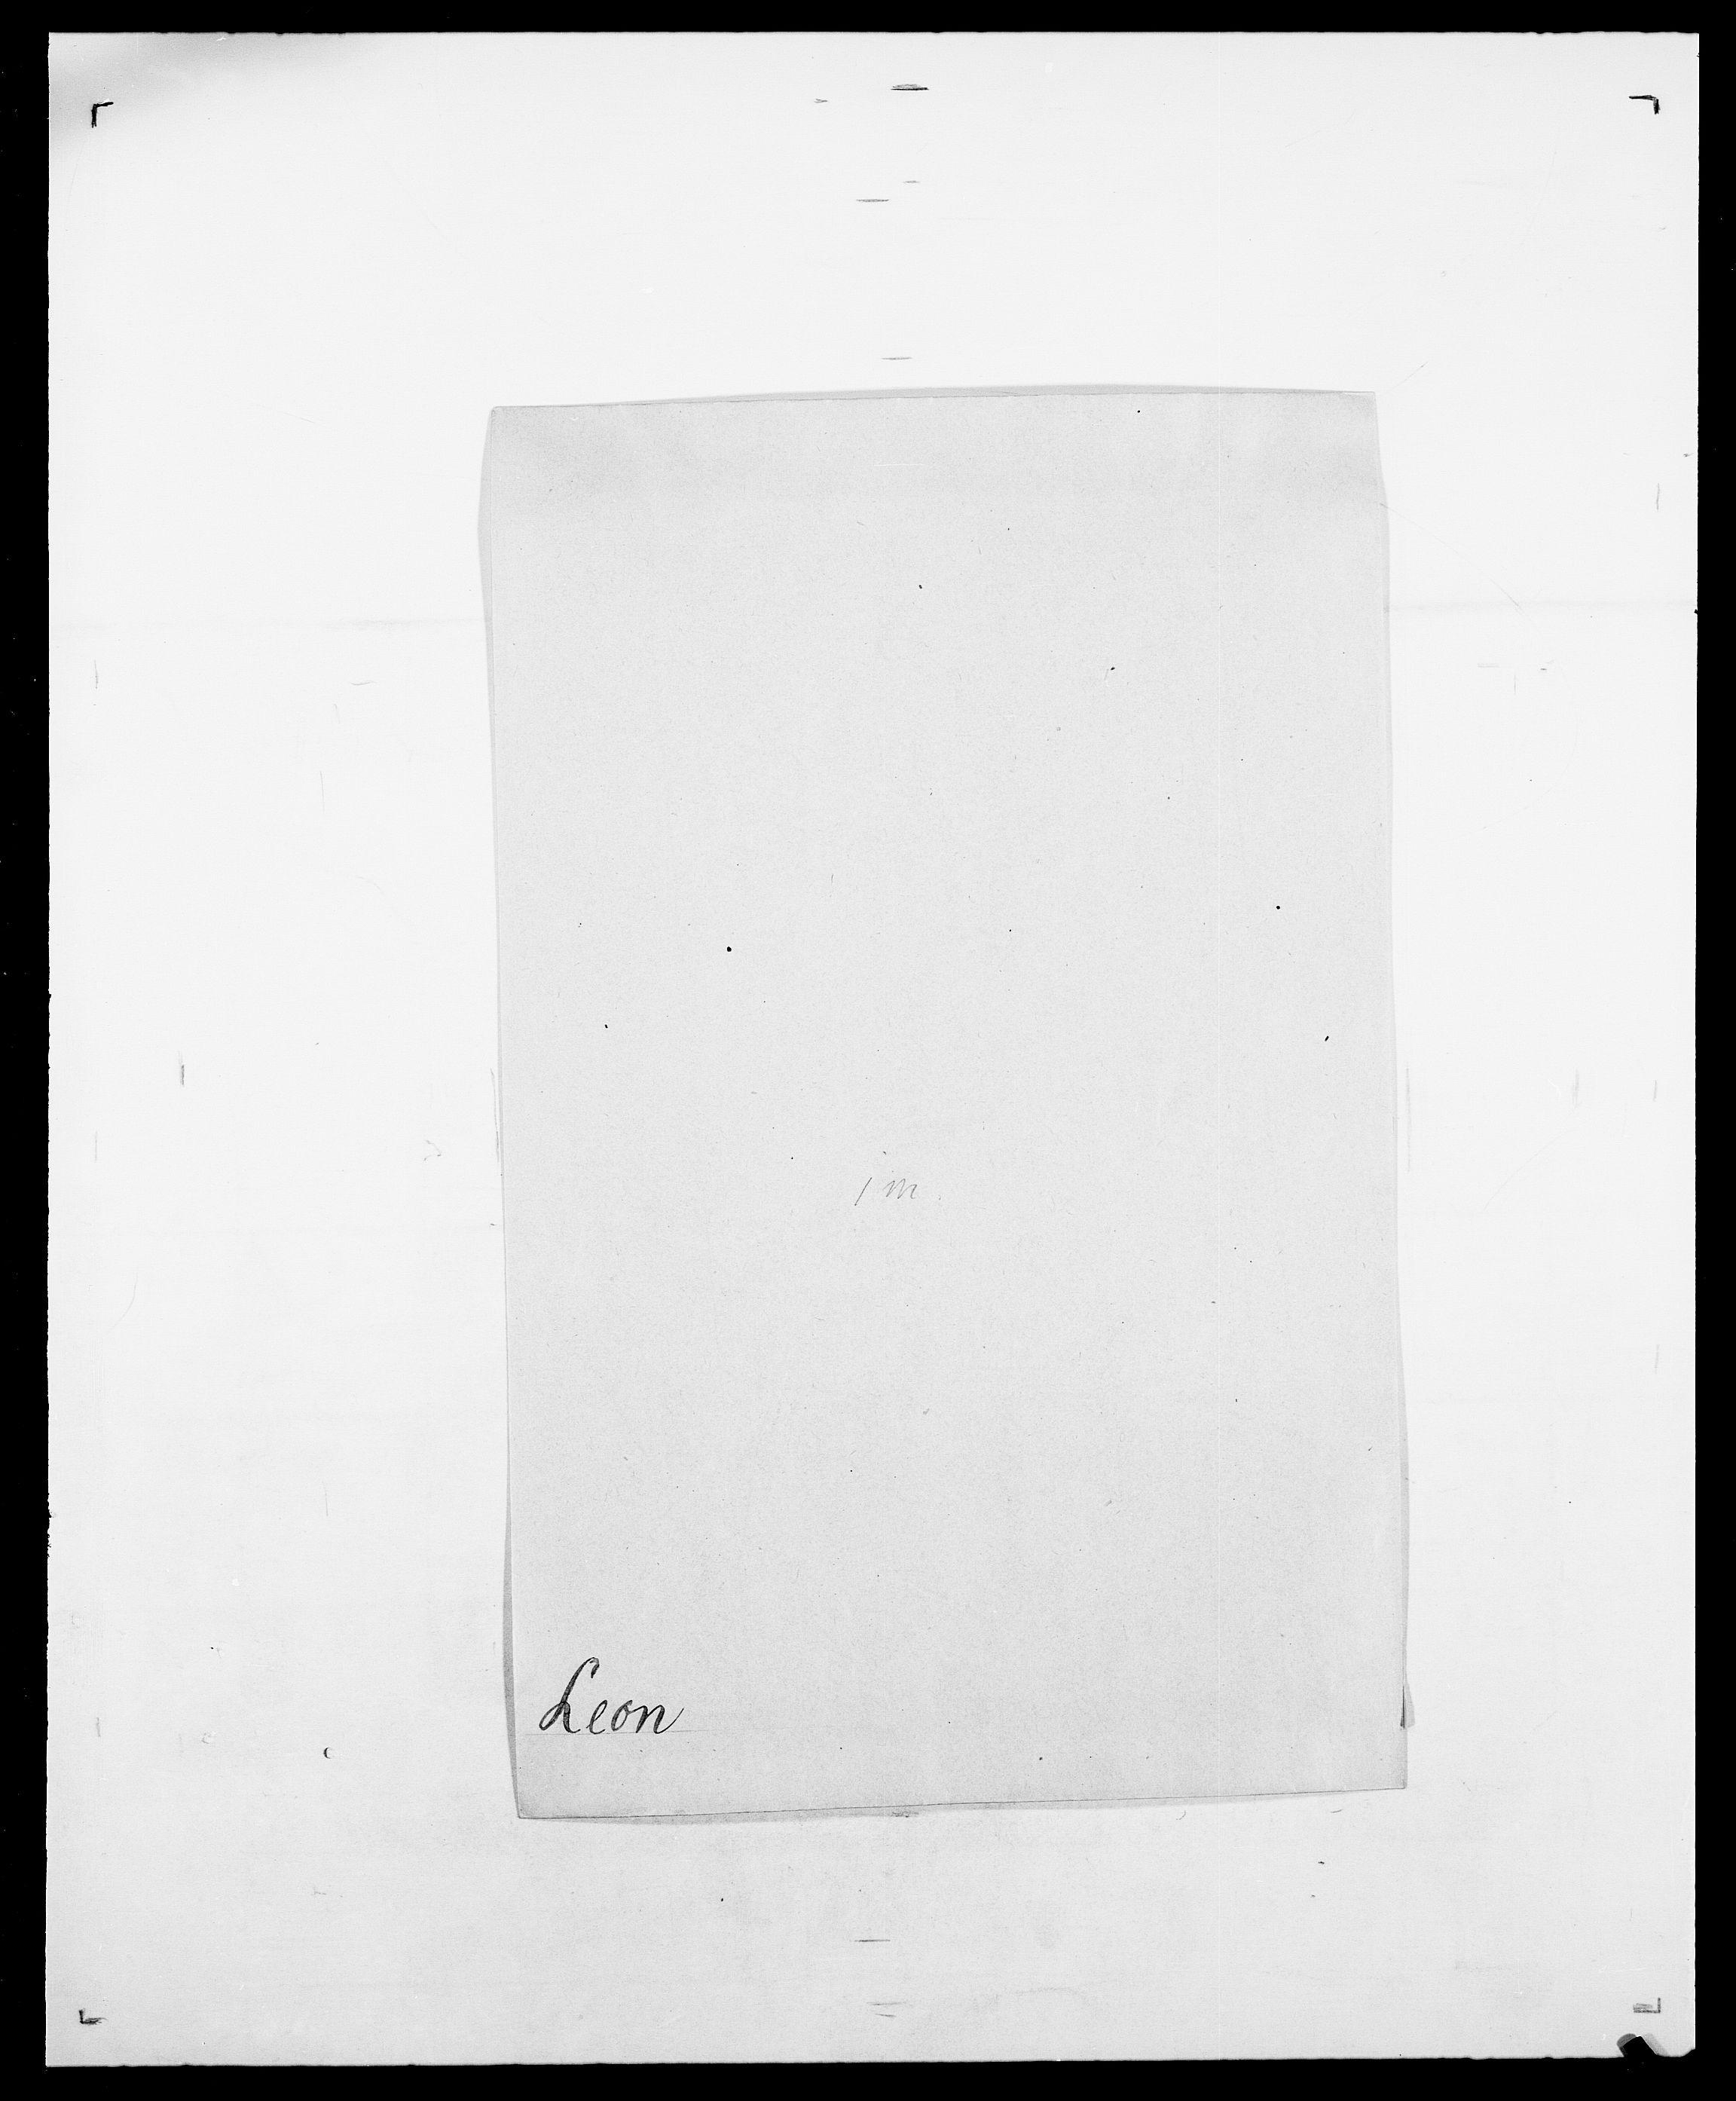 SAO, Delgobe, Charles Antoine - samling, D/Da/L0023: Lau - Lirvyn, s. 229